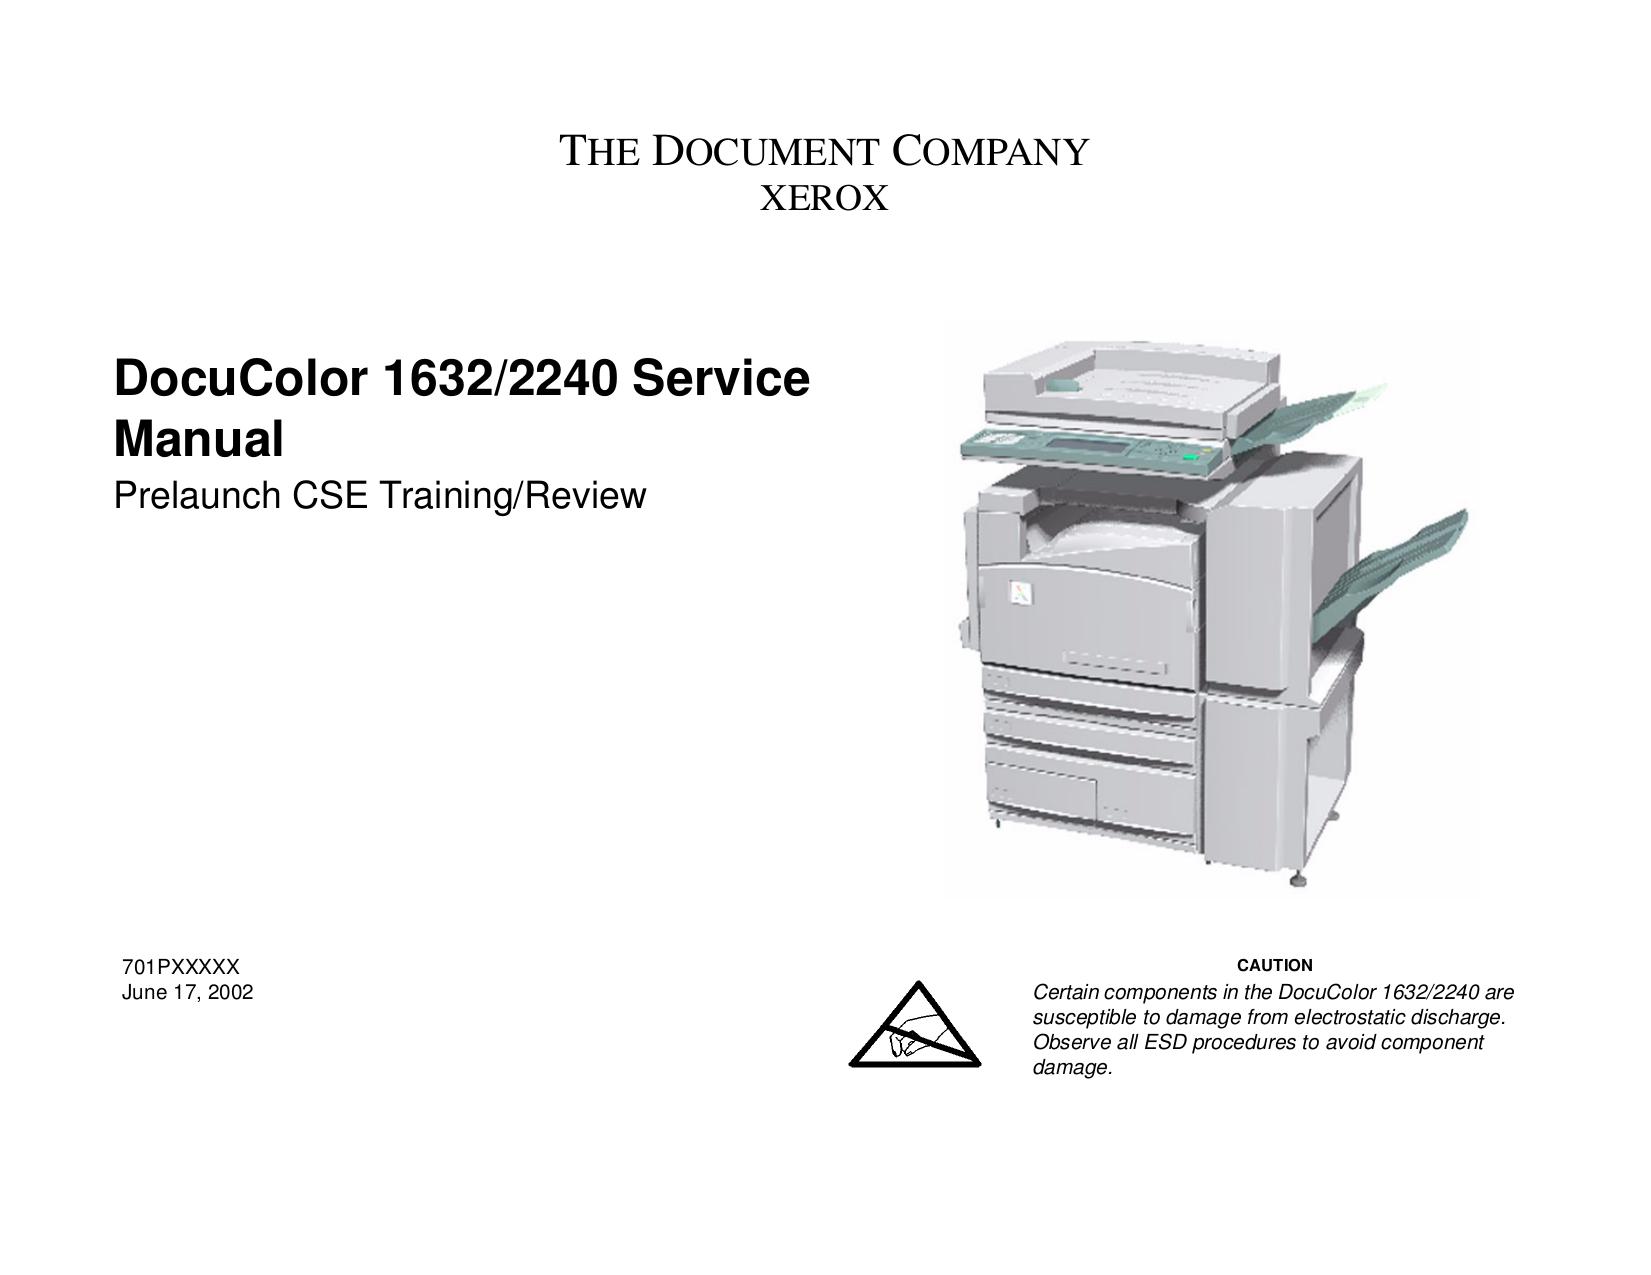 download free pdf for xerox docucolor 1632 copier manual rh umlib com xerox dc 1632 service manual Xerox DocuColor 7000